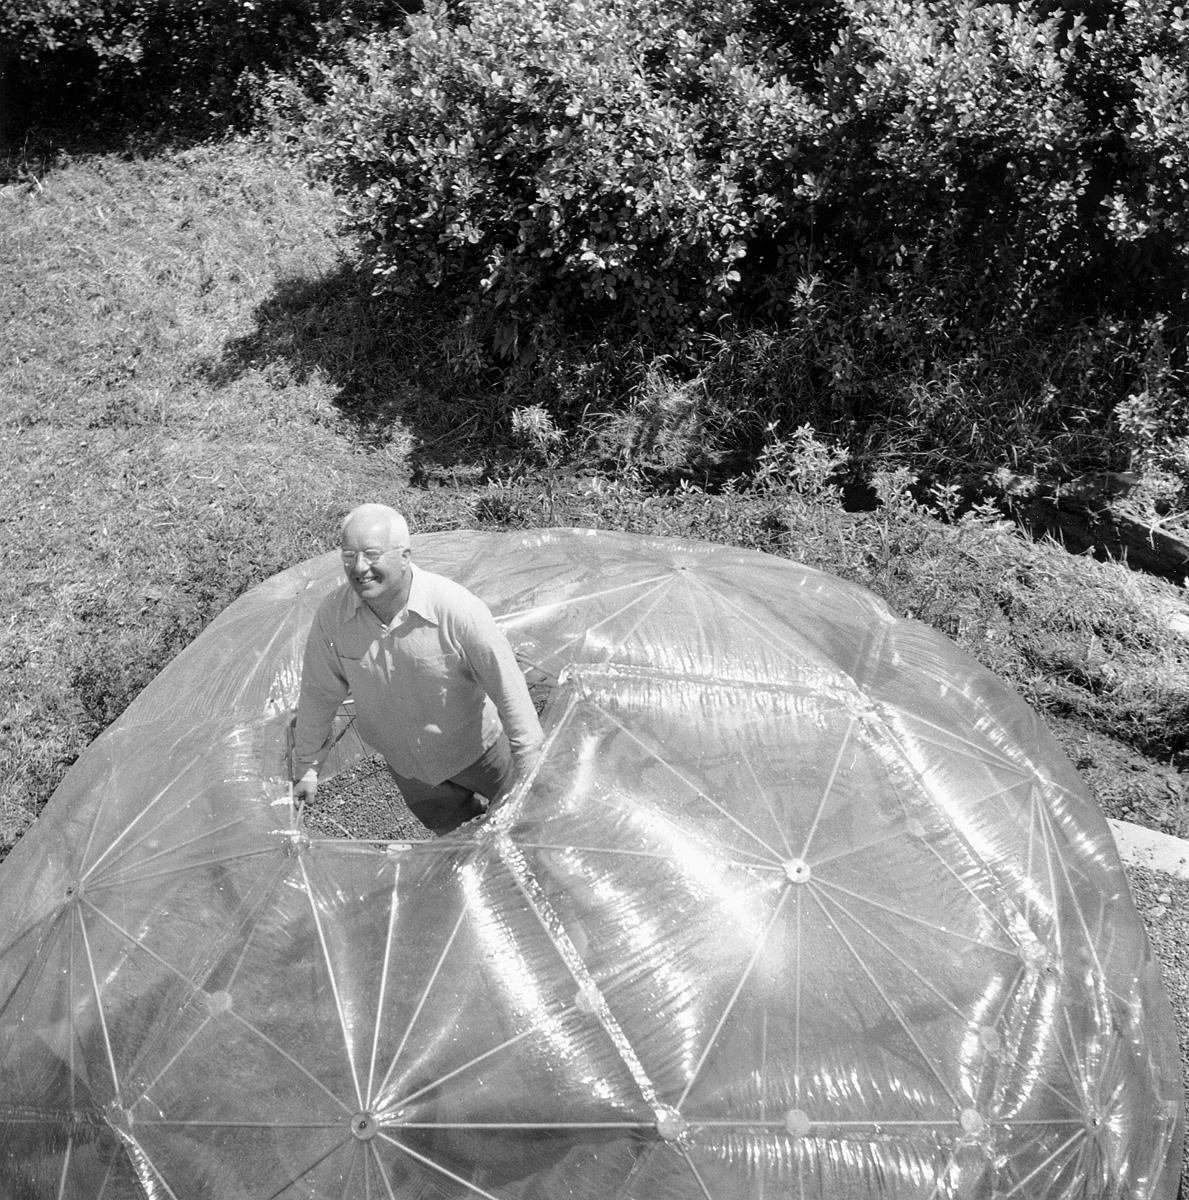 Hazel Larsen Archer, Buckminster Fuller in His Dome, Summer 1949